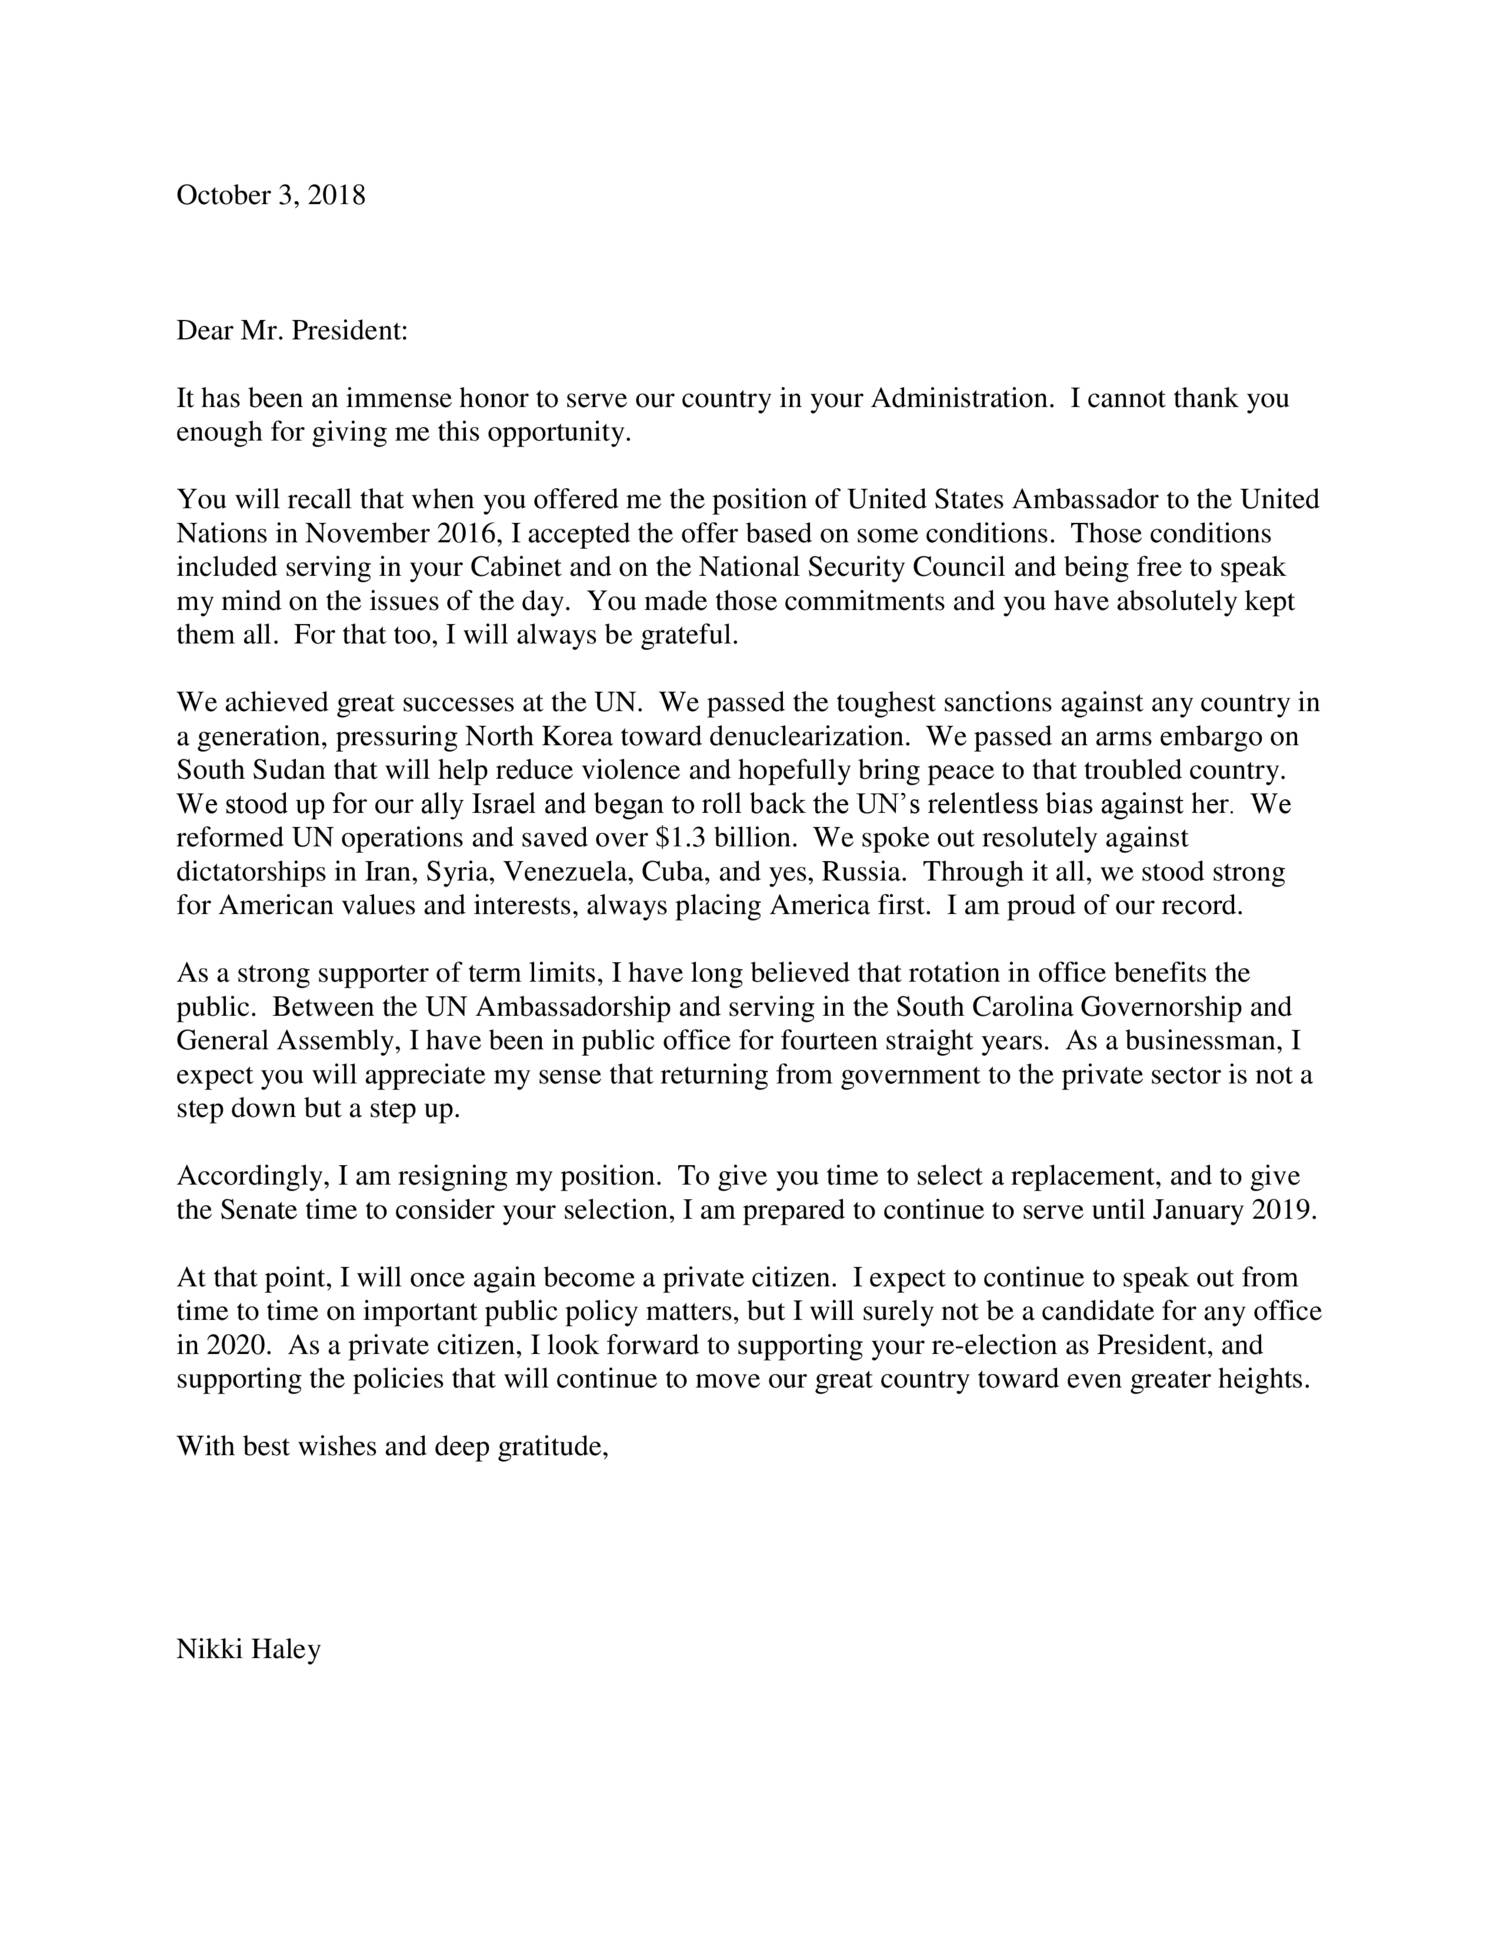 nikki haley resignation letter.pdf | DocDroid